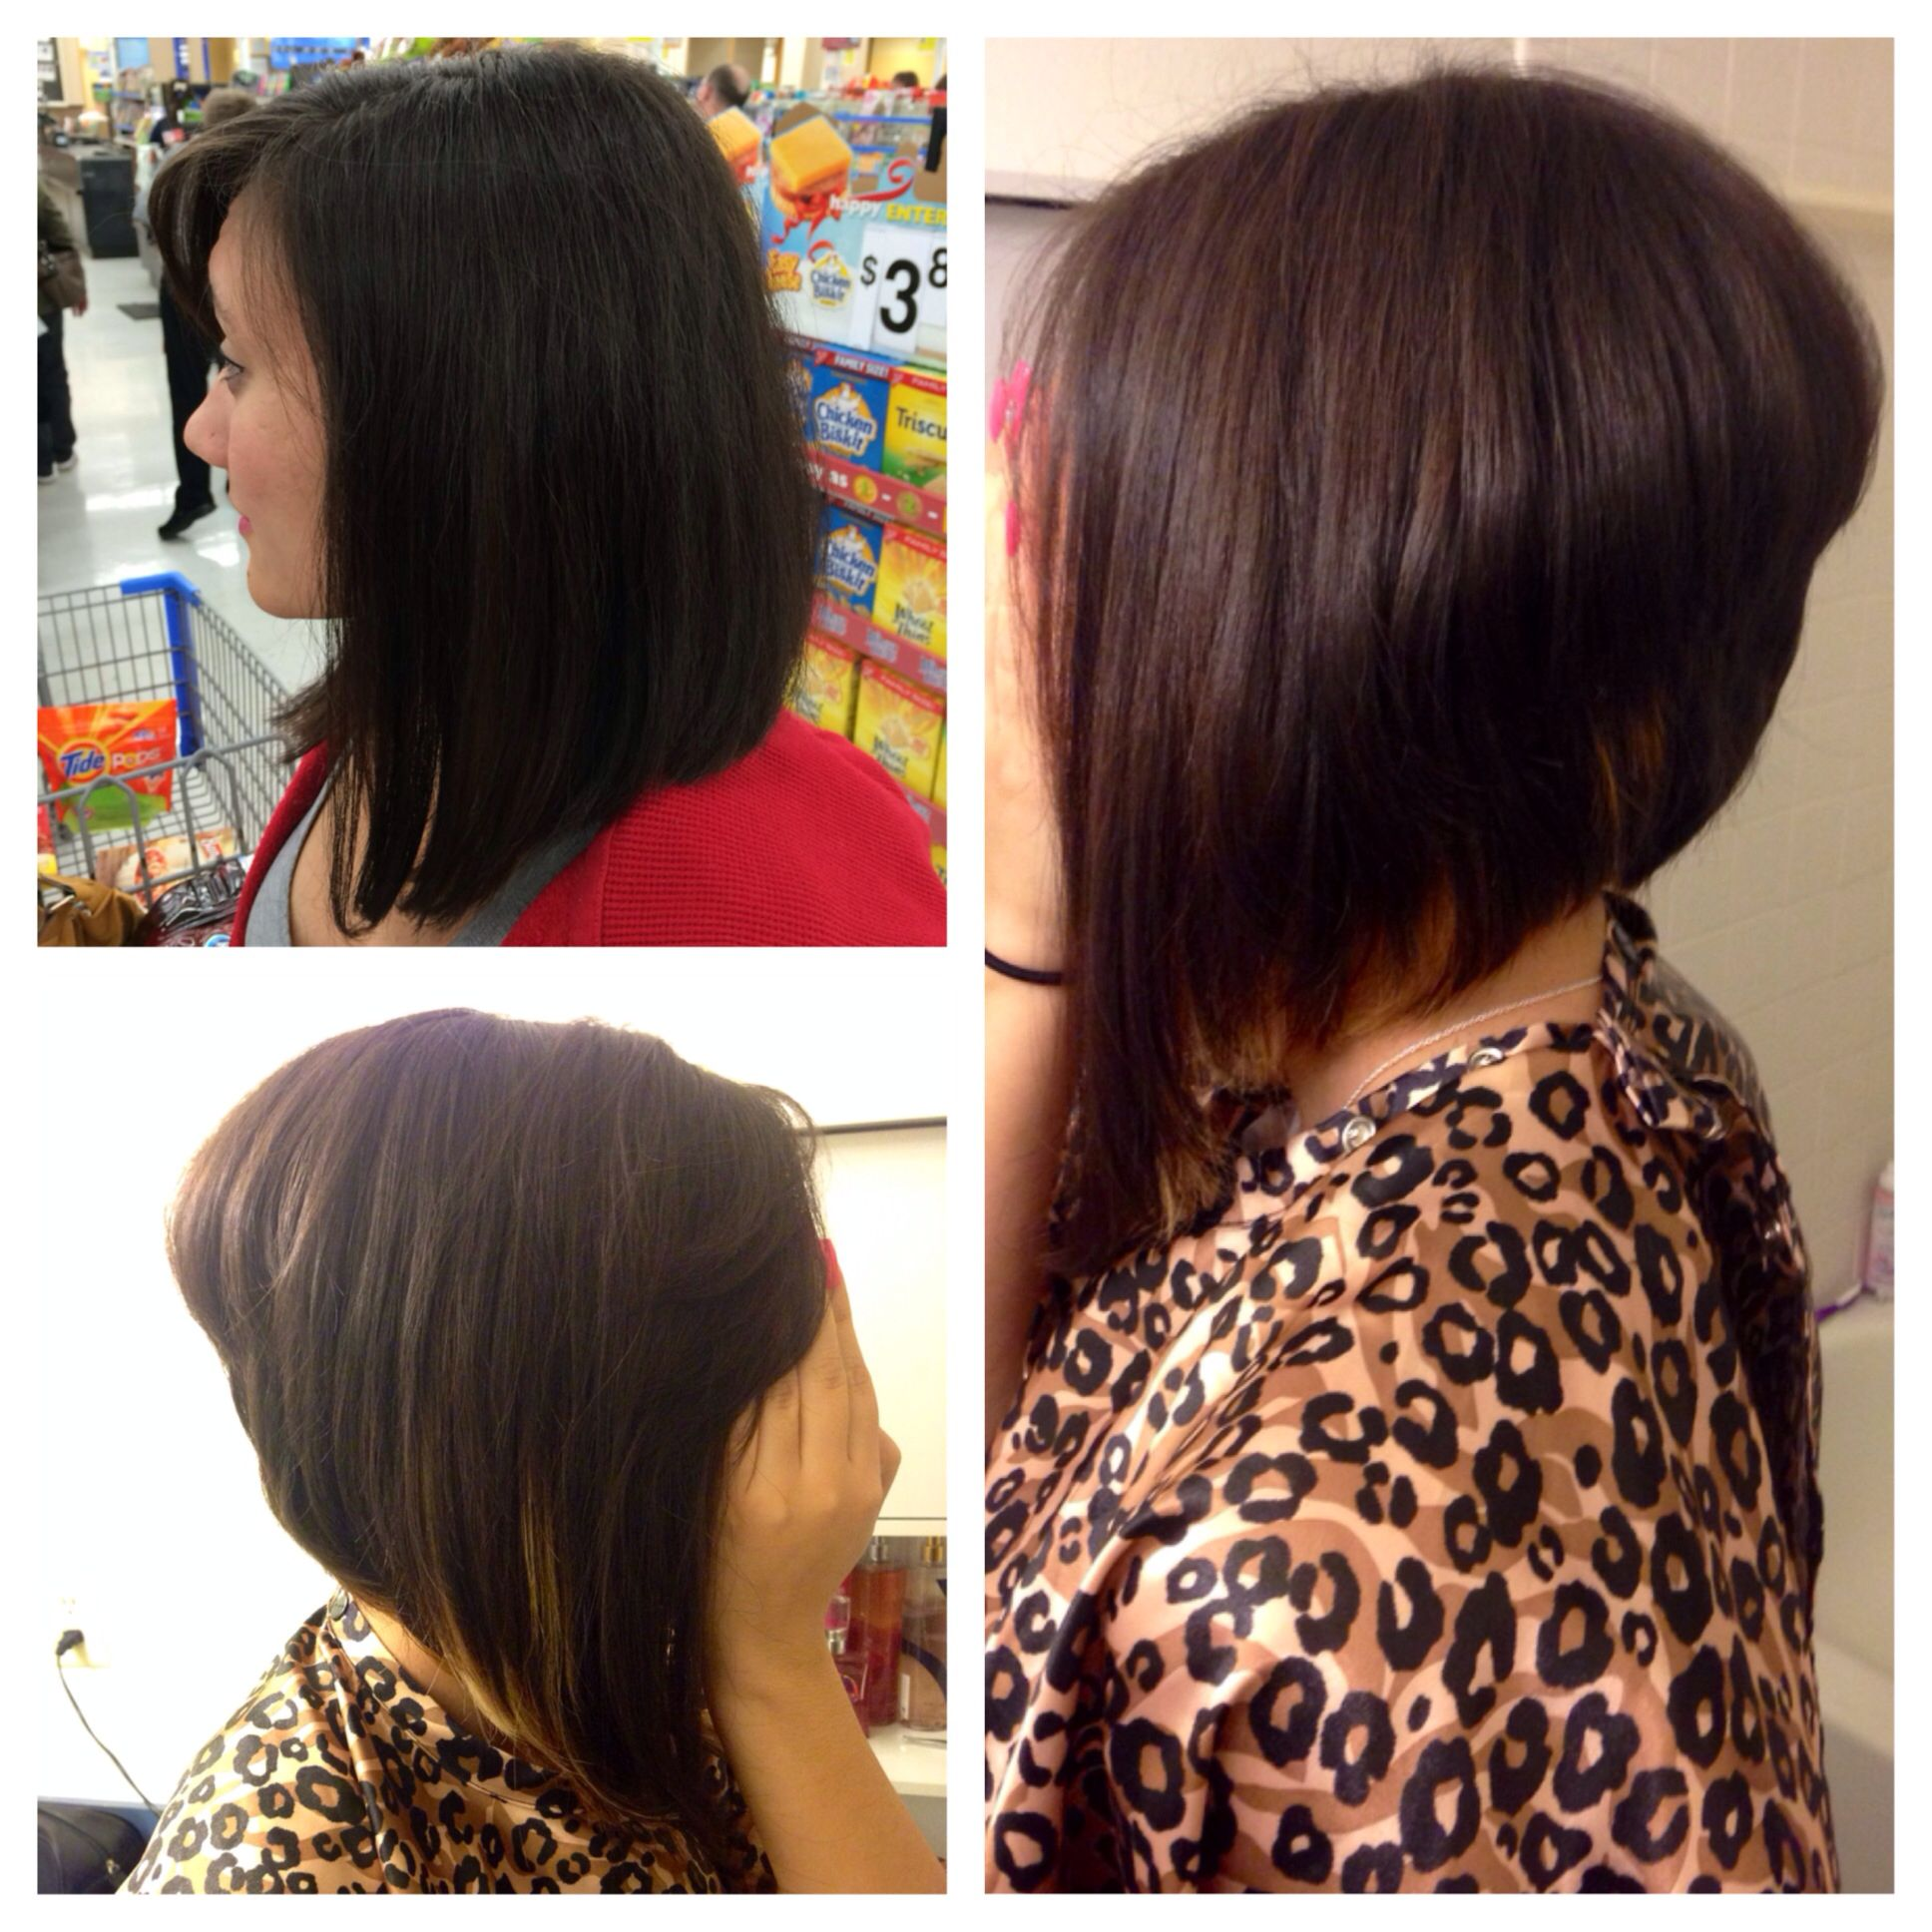 Dramatic Bob Haircut Before And After Haircut Should I Or